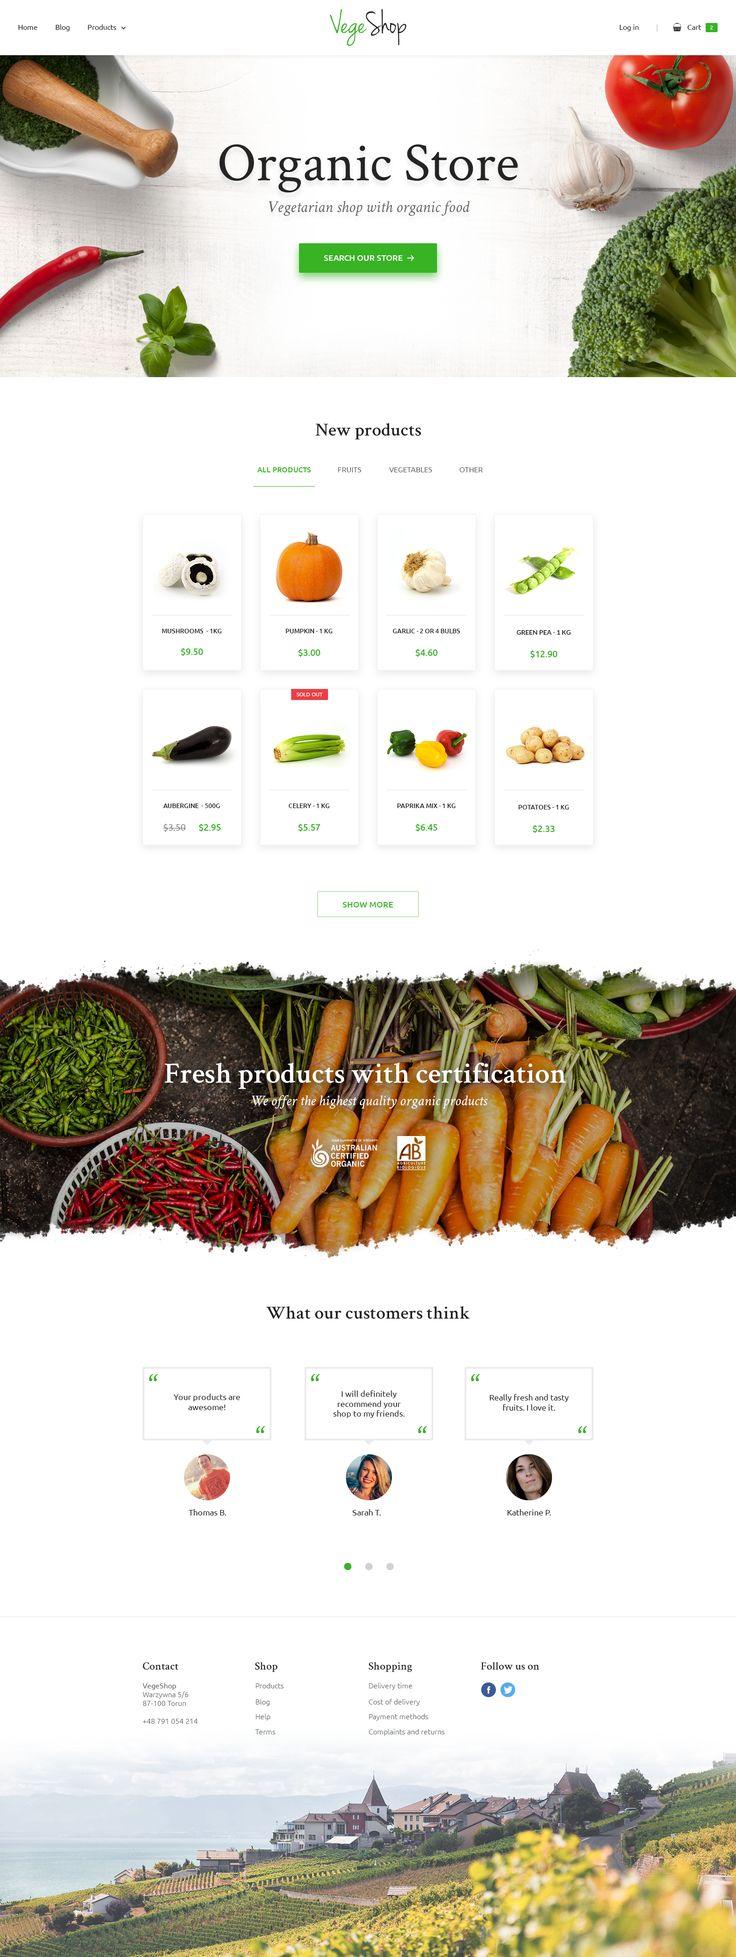 Vegetarian Shop – Website by Robert Licau